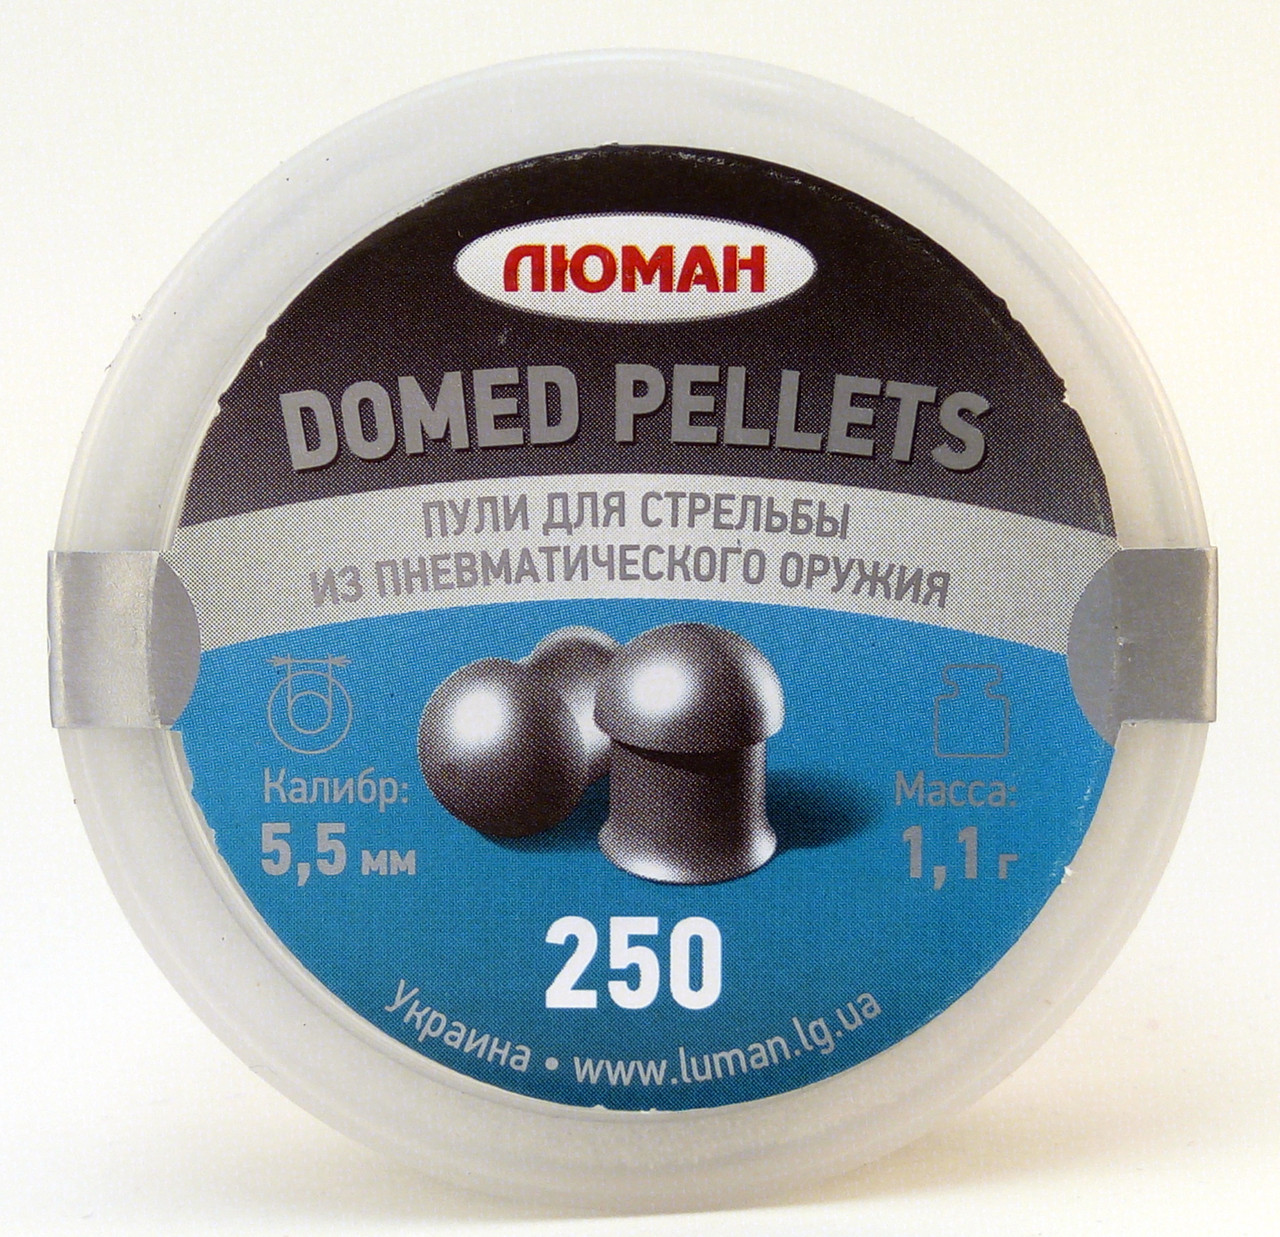 Пули Люман Domed Pellets 5,5 мм 1.1 г. (250 шт.)